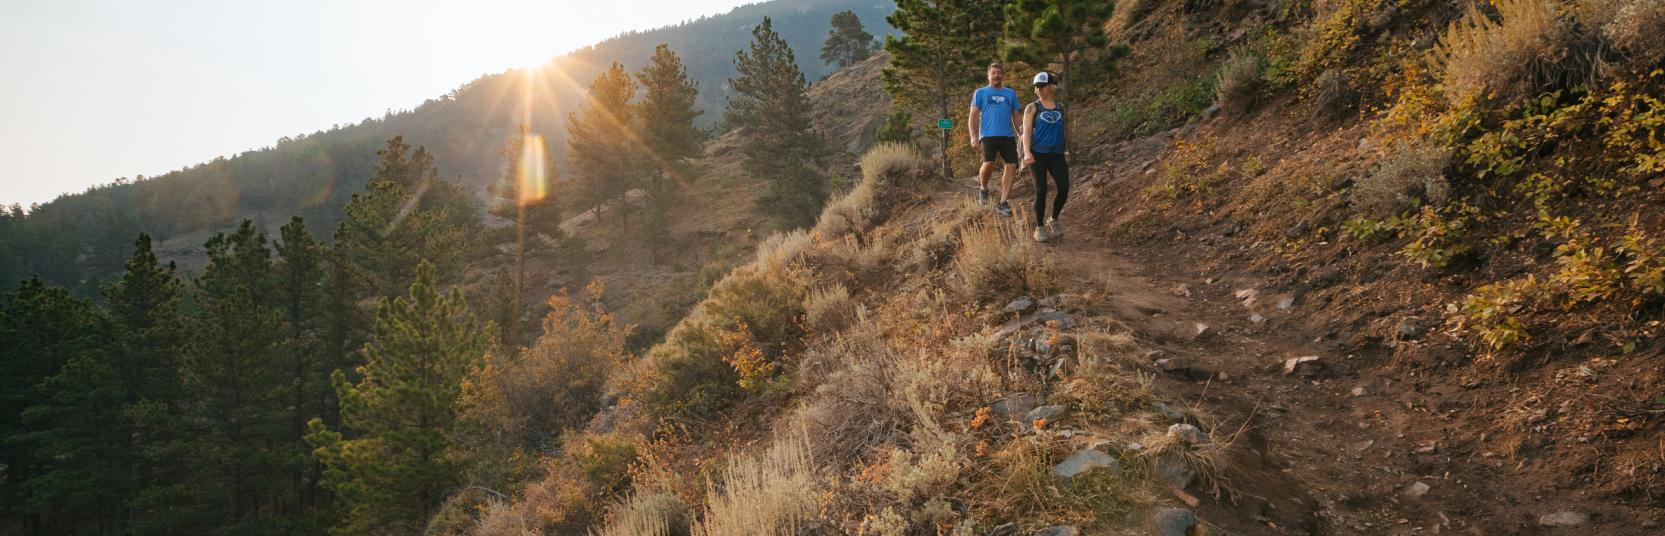 Couple Hiking on Casper Mountain